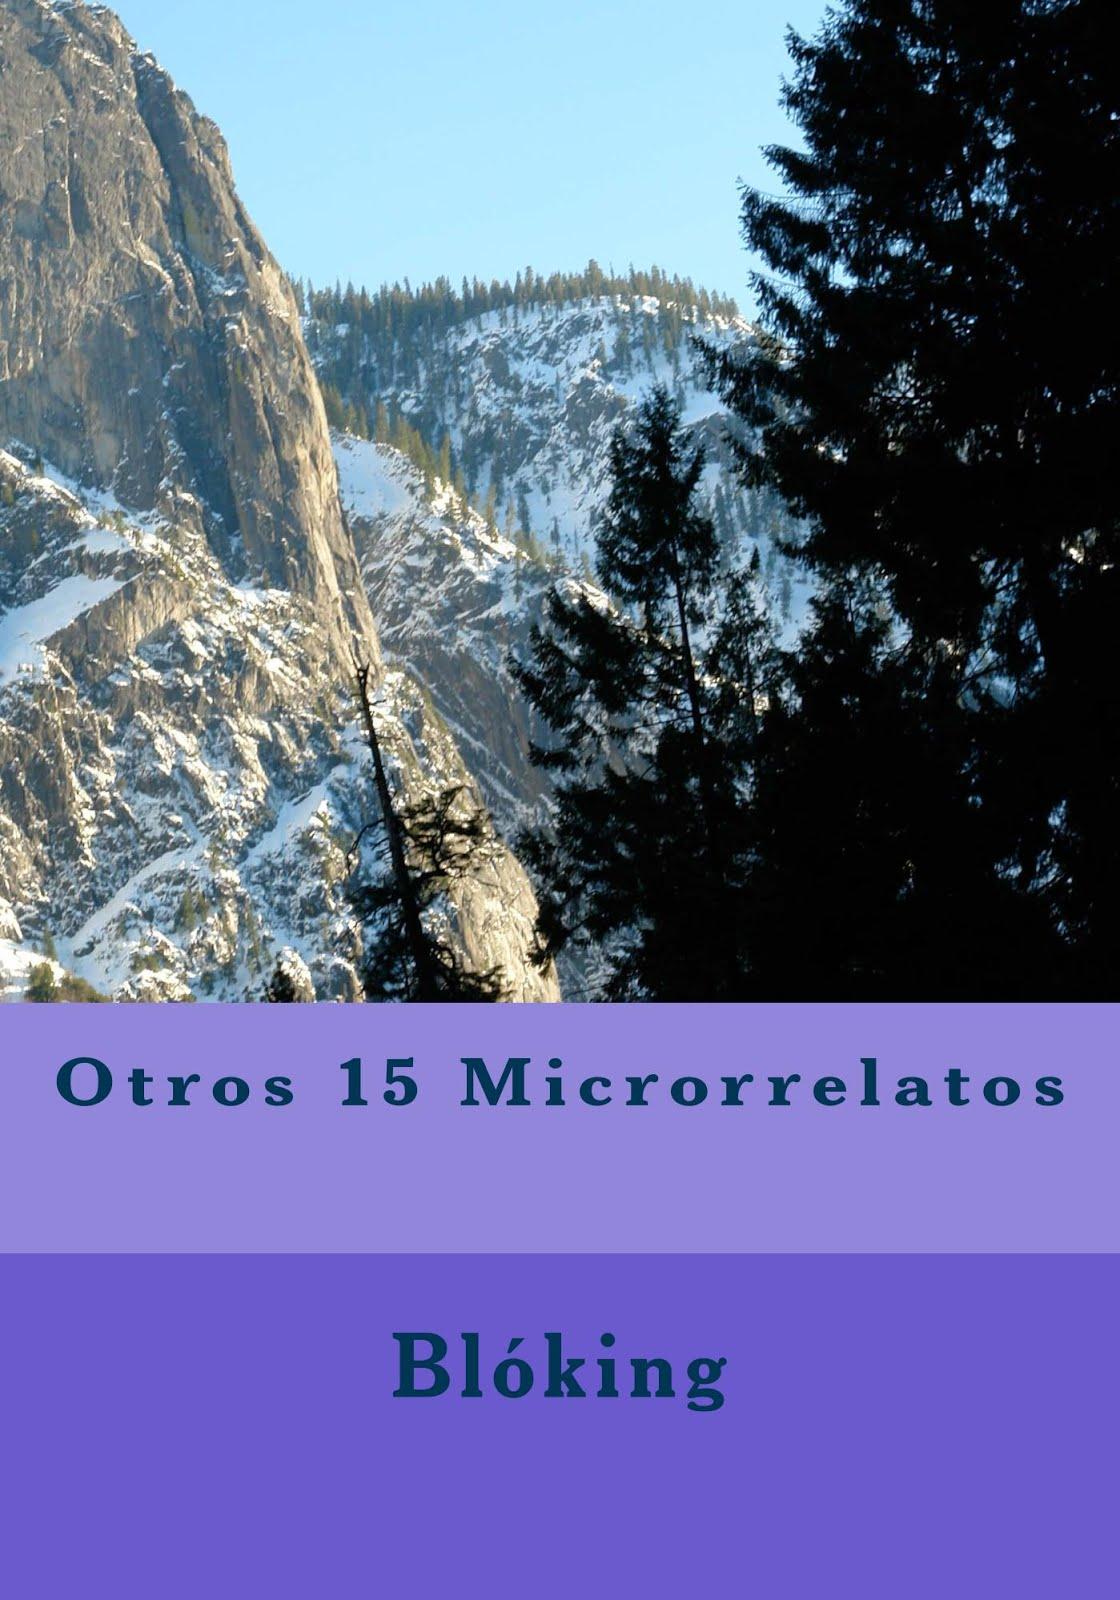 #Obra 8 - Otros 15 Microrrelatos